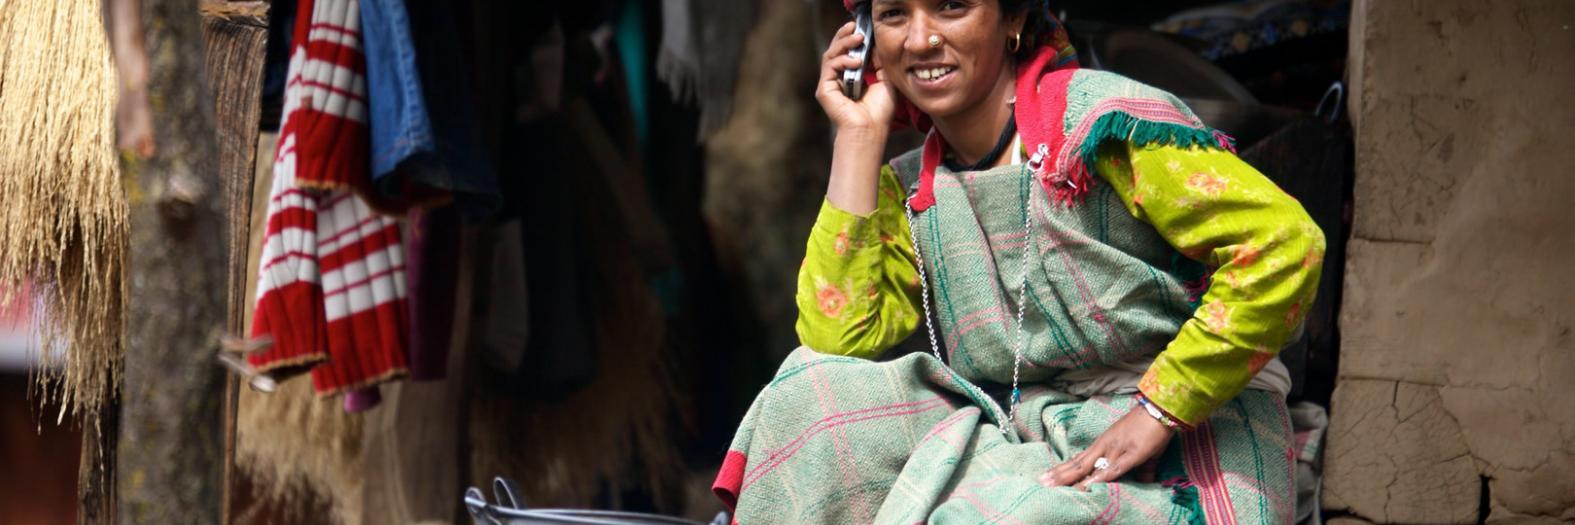 maid-mobile-phone-banner.jpg